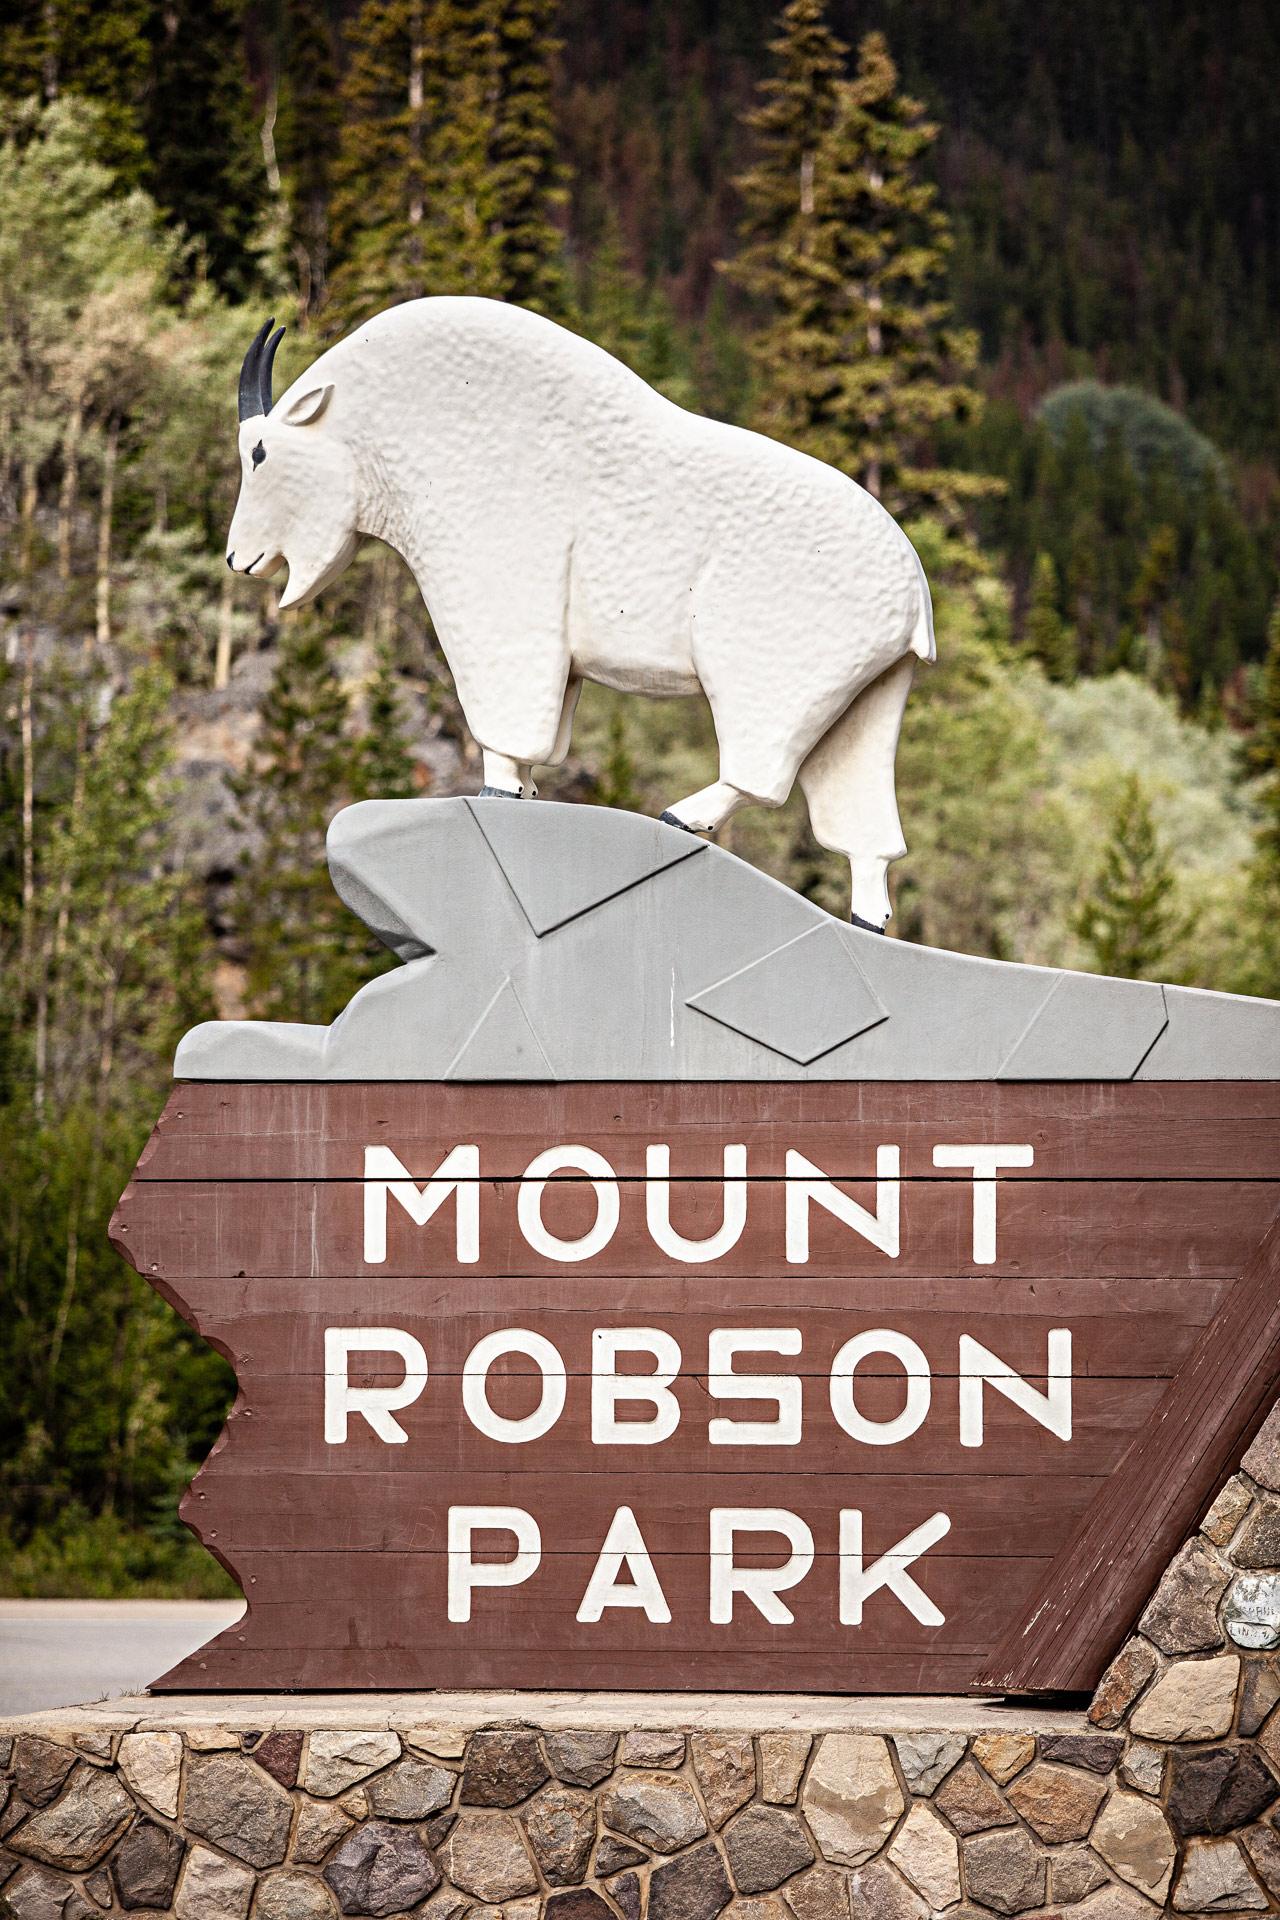 Mount Robson Park Colombie-Britannique Canada